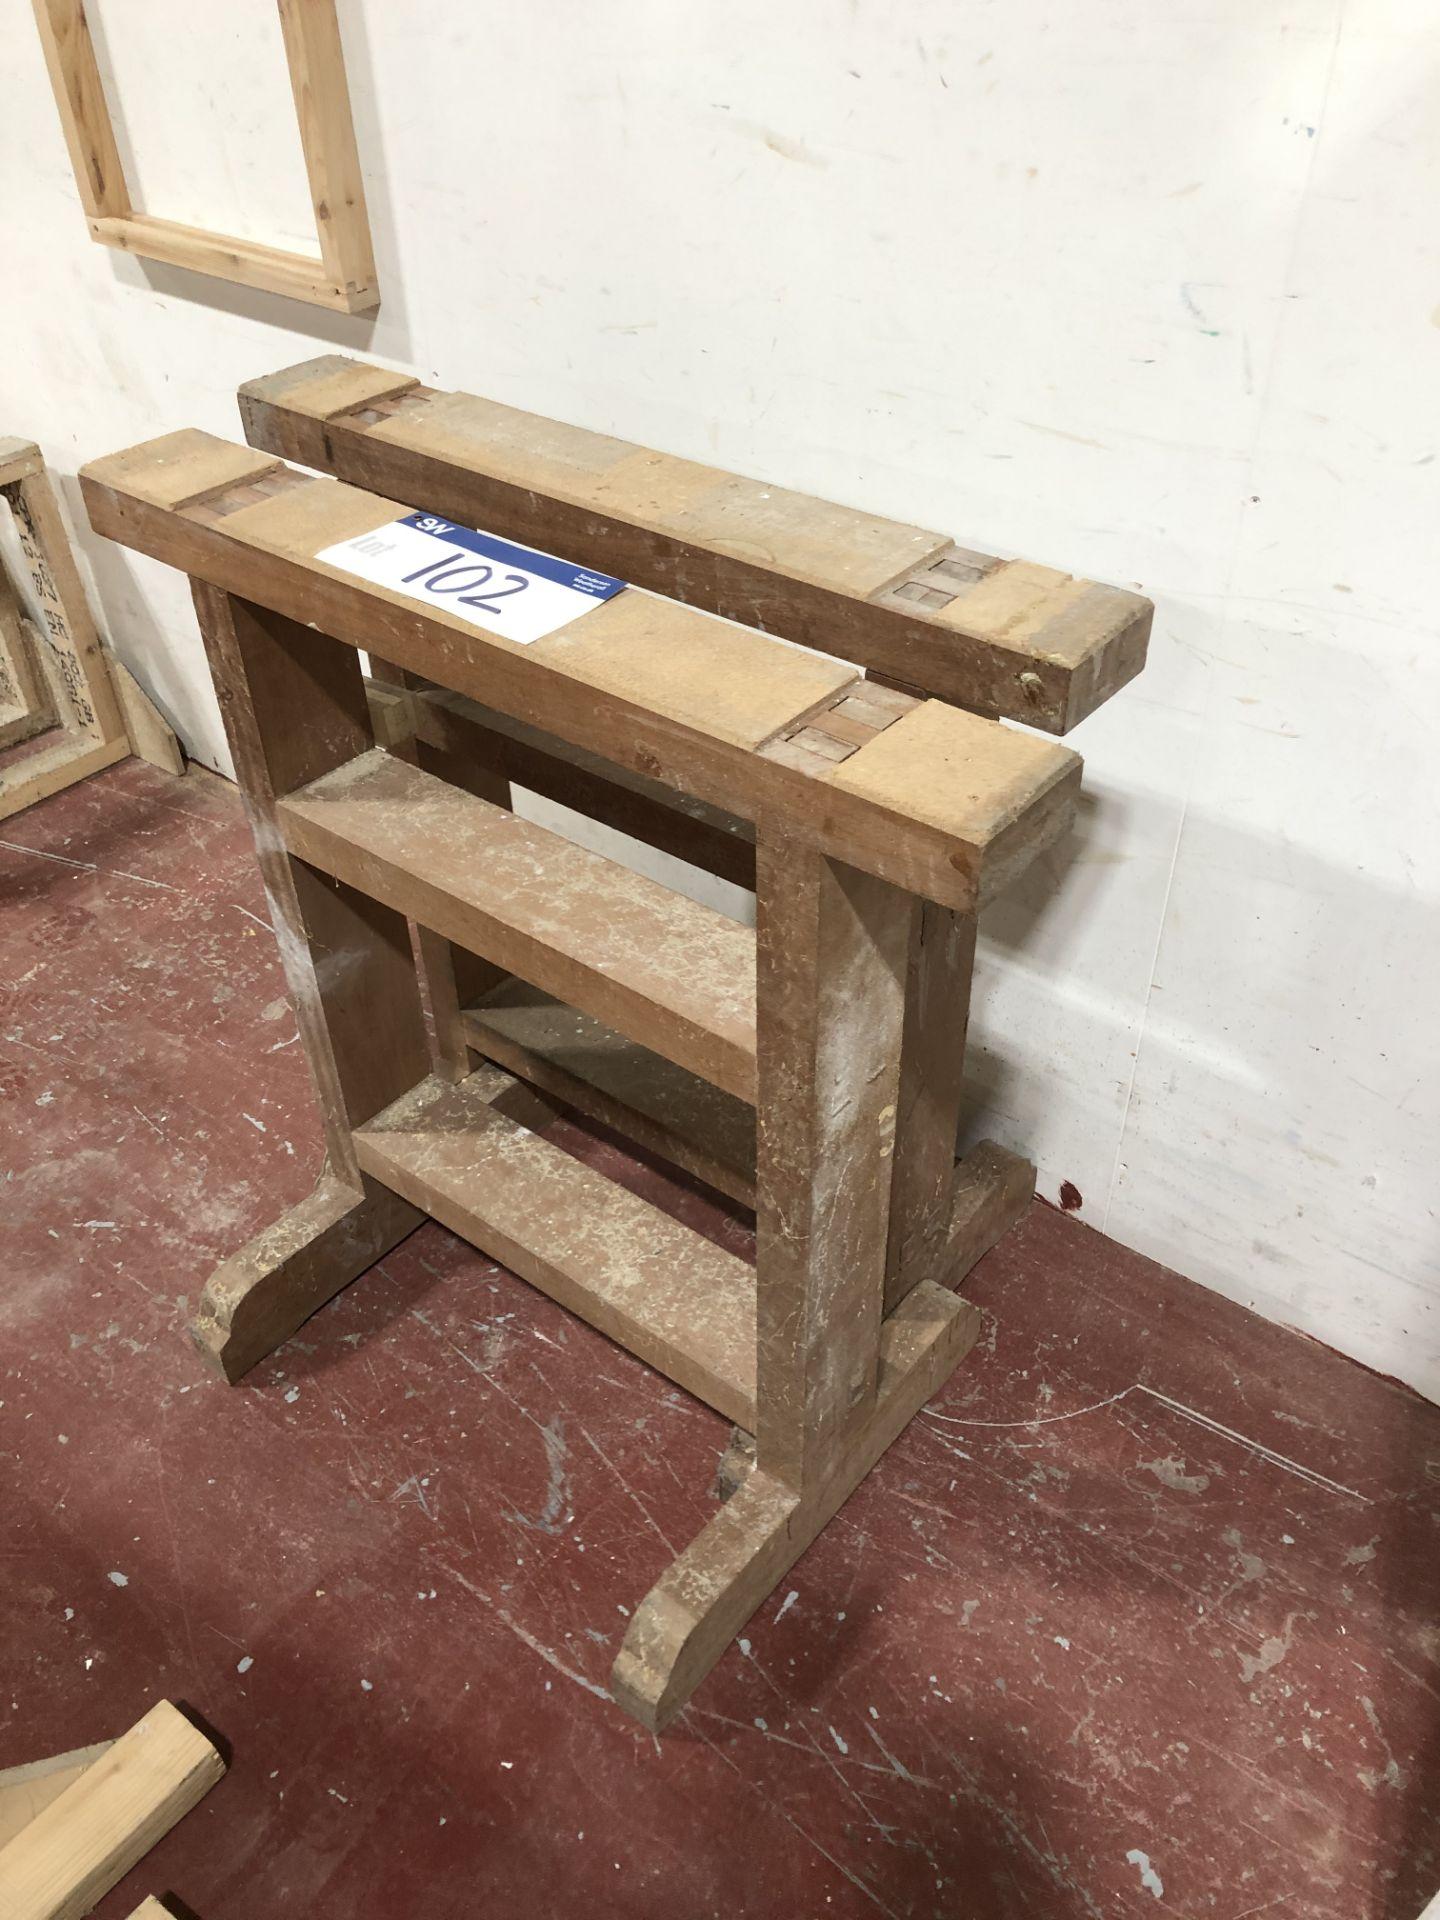 Lot 102 - 2 Wooden Trestles